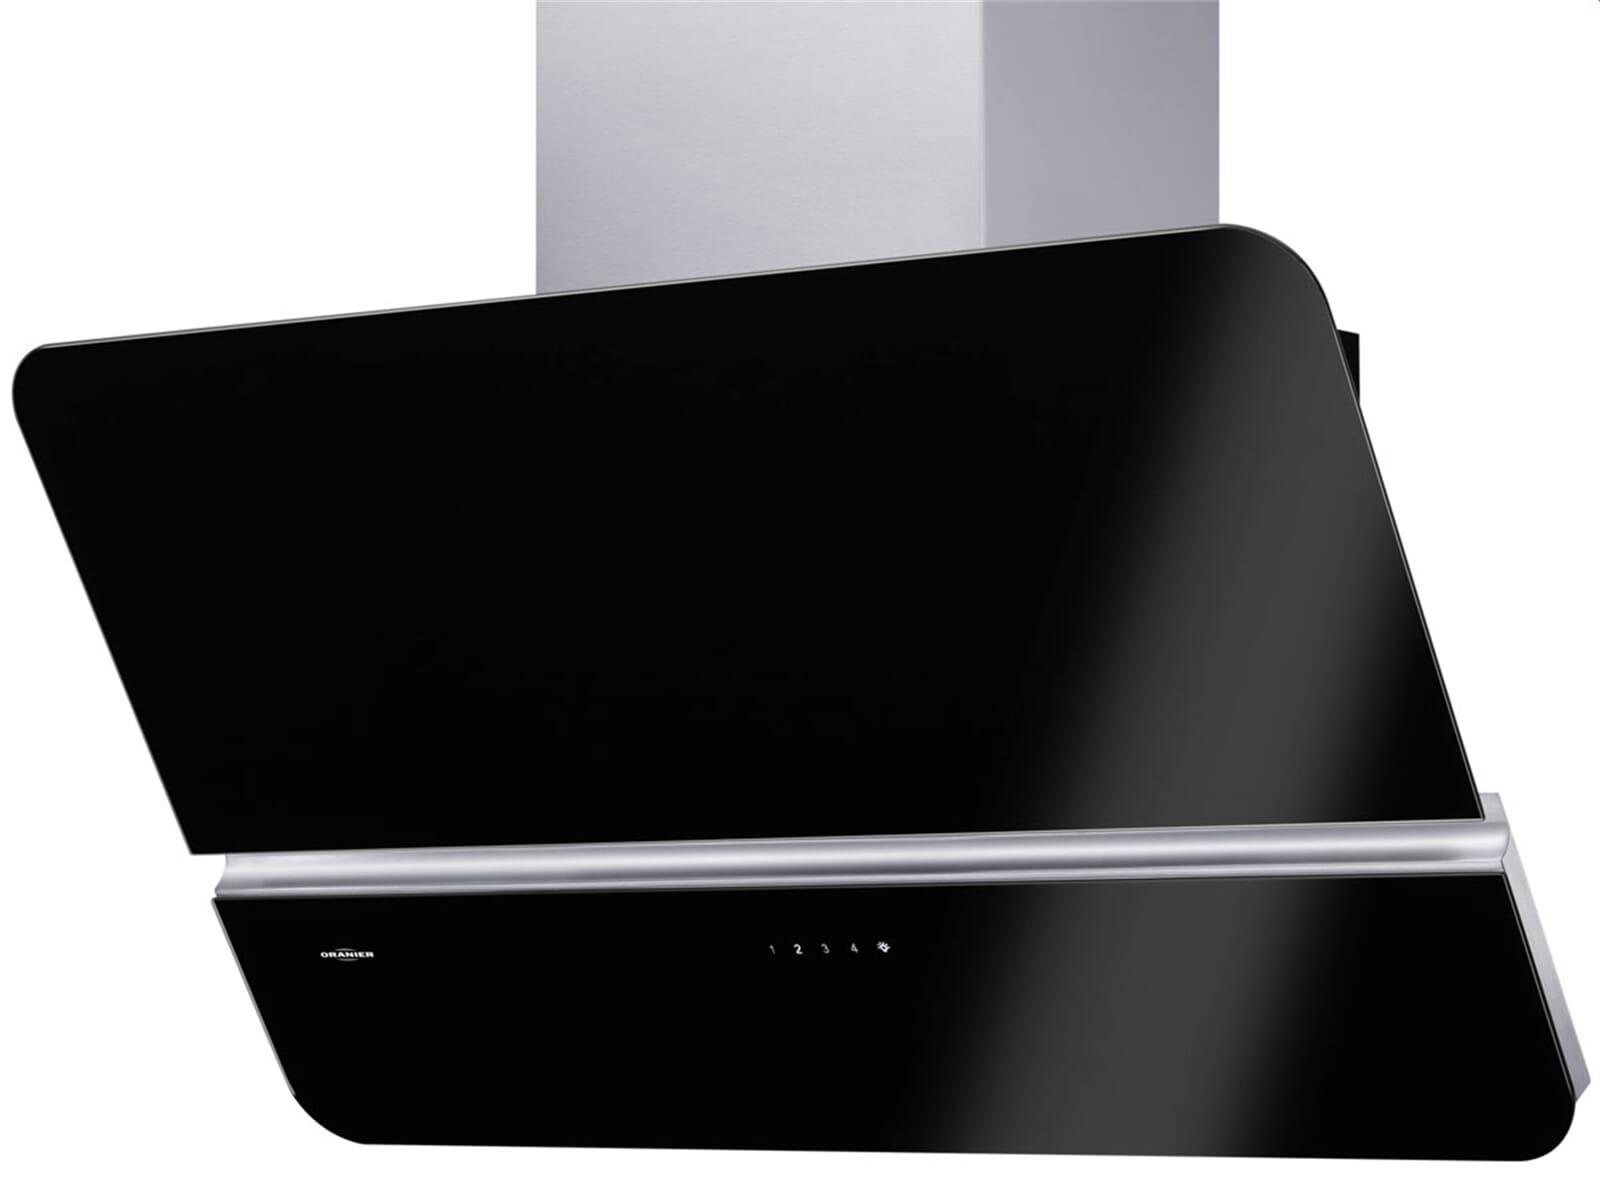 oranier signa 90 s 8623 90 kopffreihaube schwarz. Black Bedroom Furniture Sets. Home Design Ideas